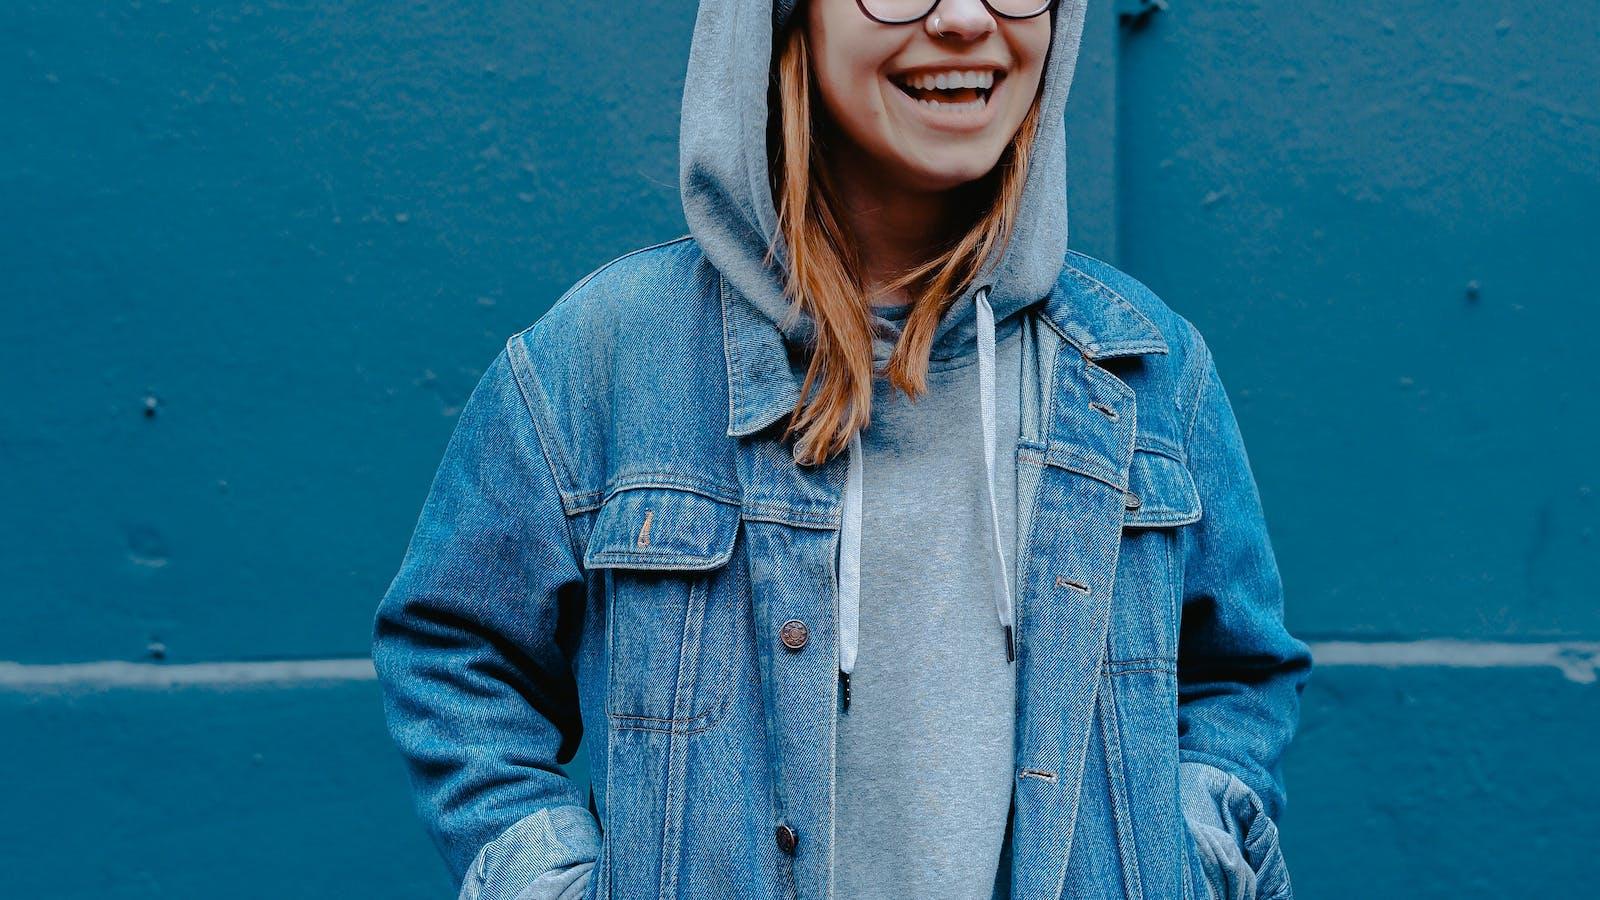 Raising Teens Requires Listening Well